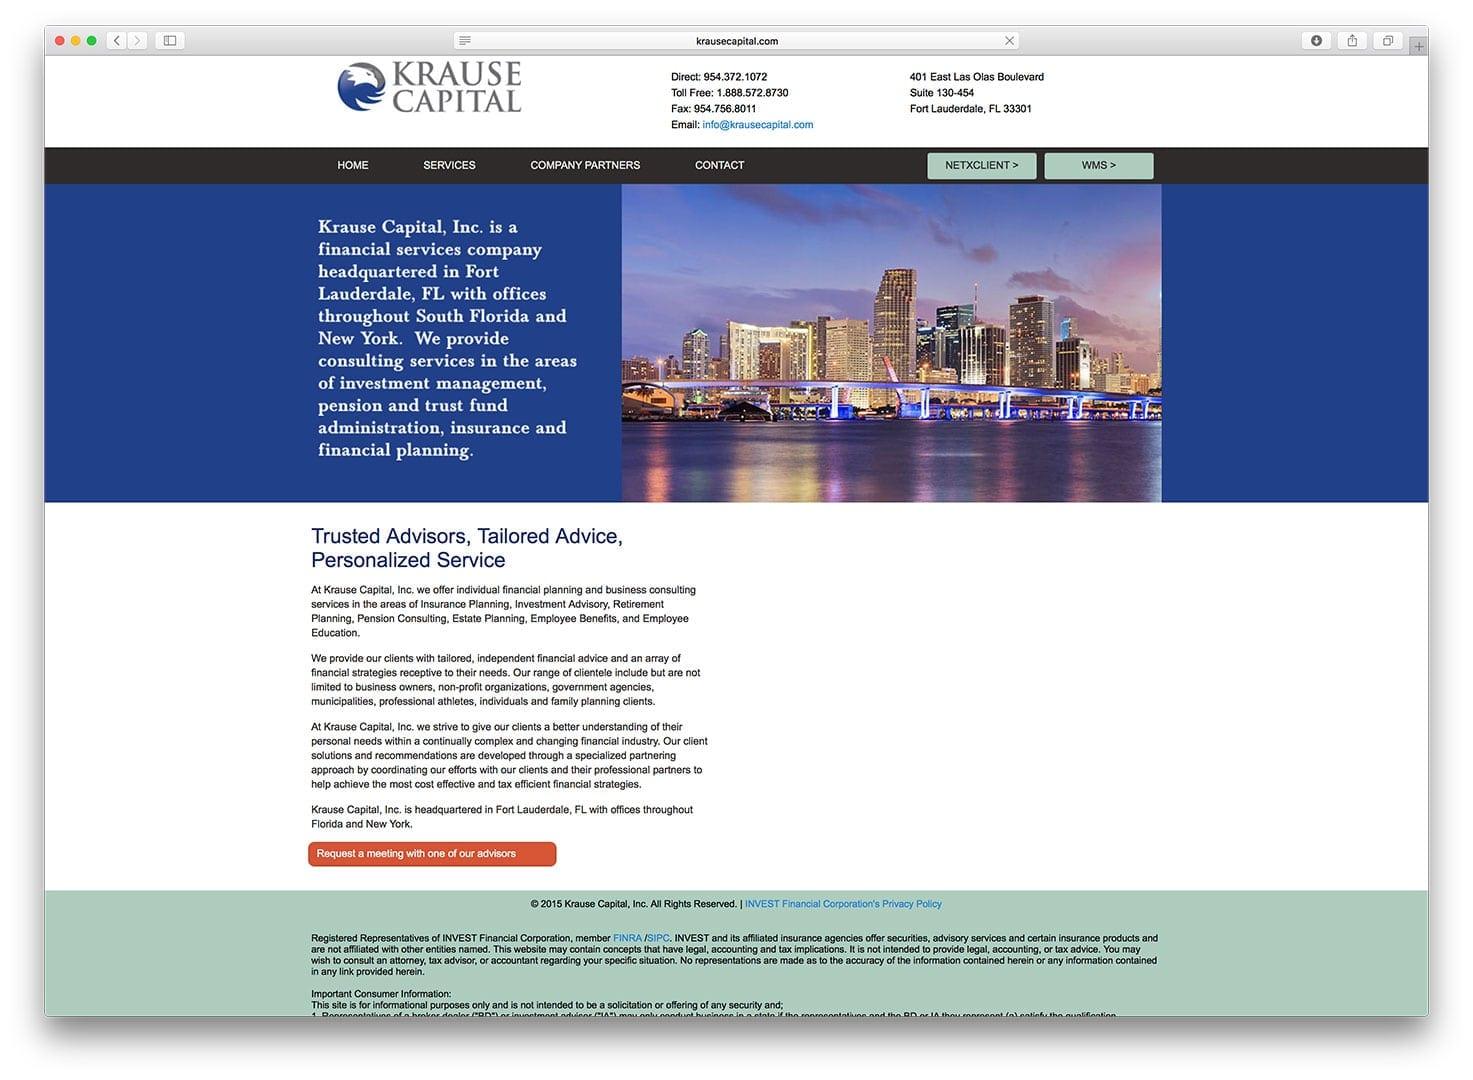 Krause Capital Web Design - Finance Web Design - sliStudios - Miami Beach